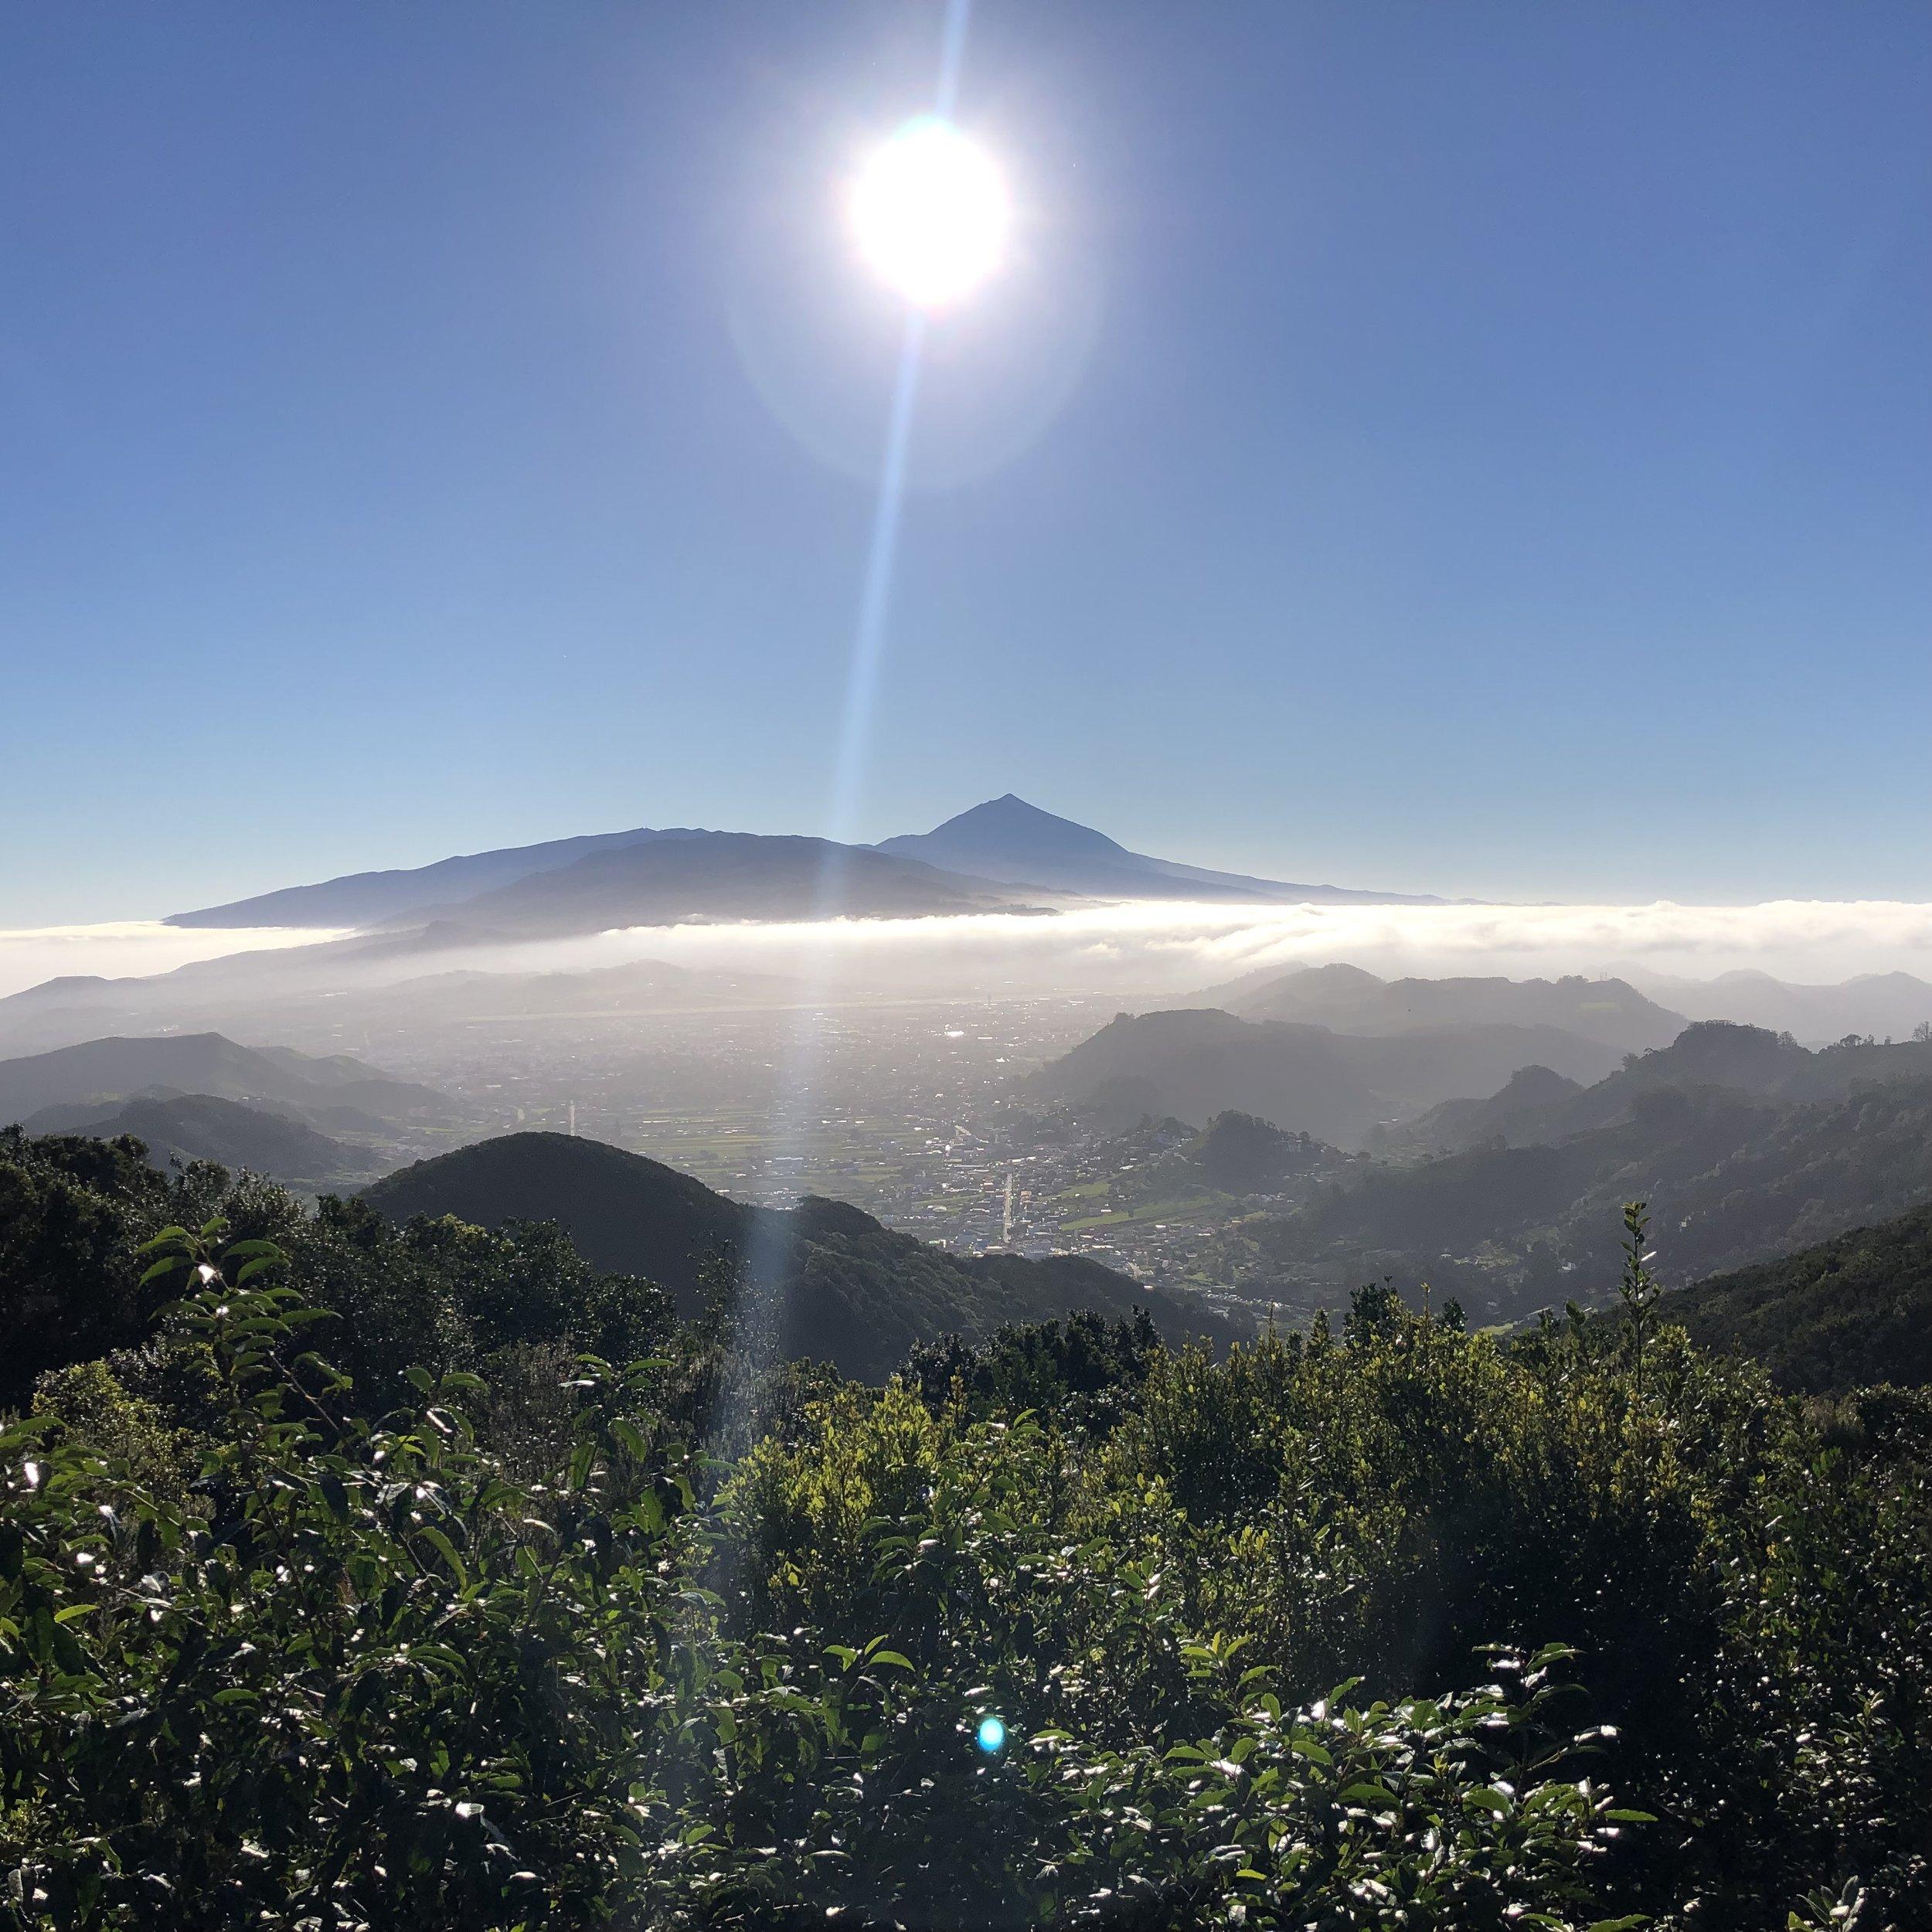 Mount Teide seen from Anaga park.